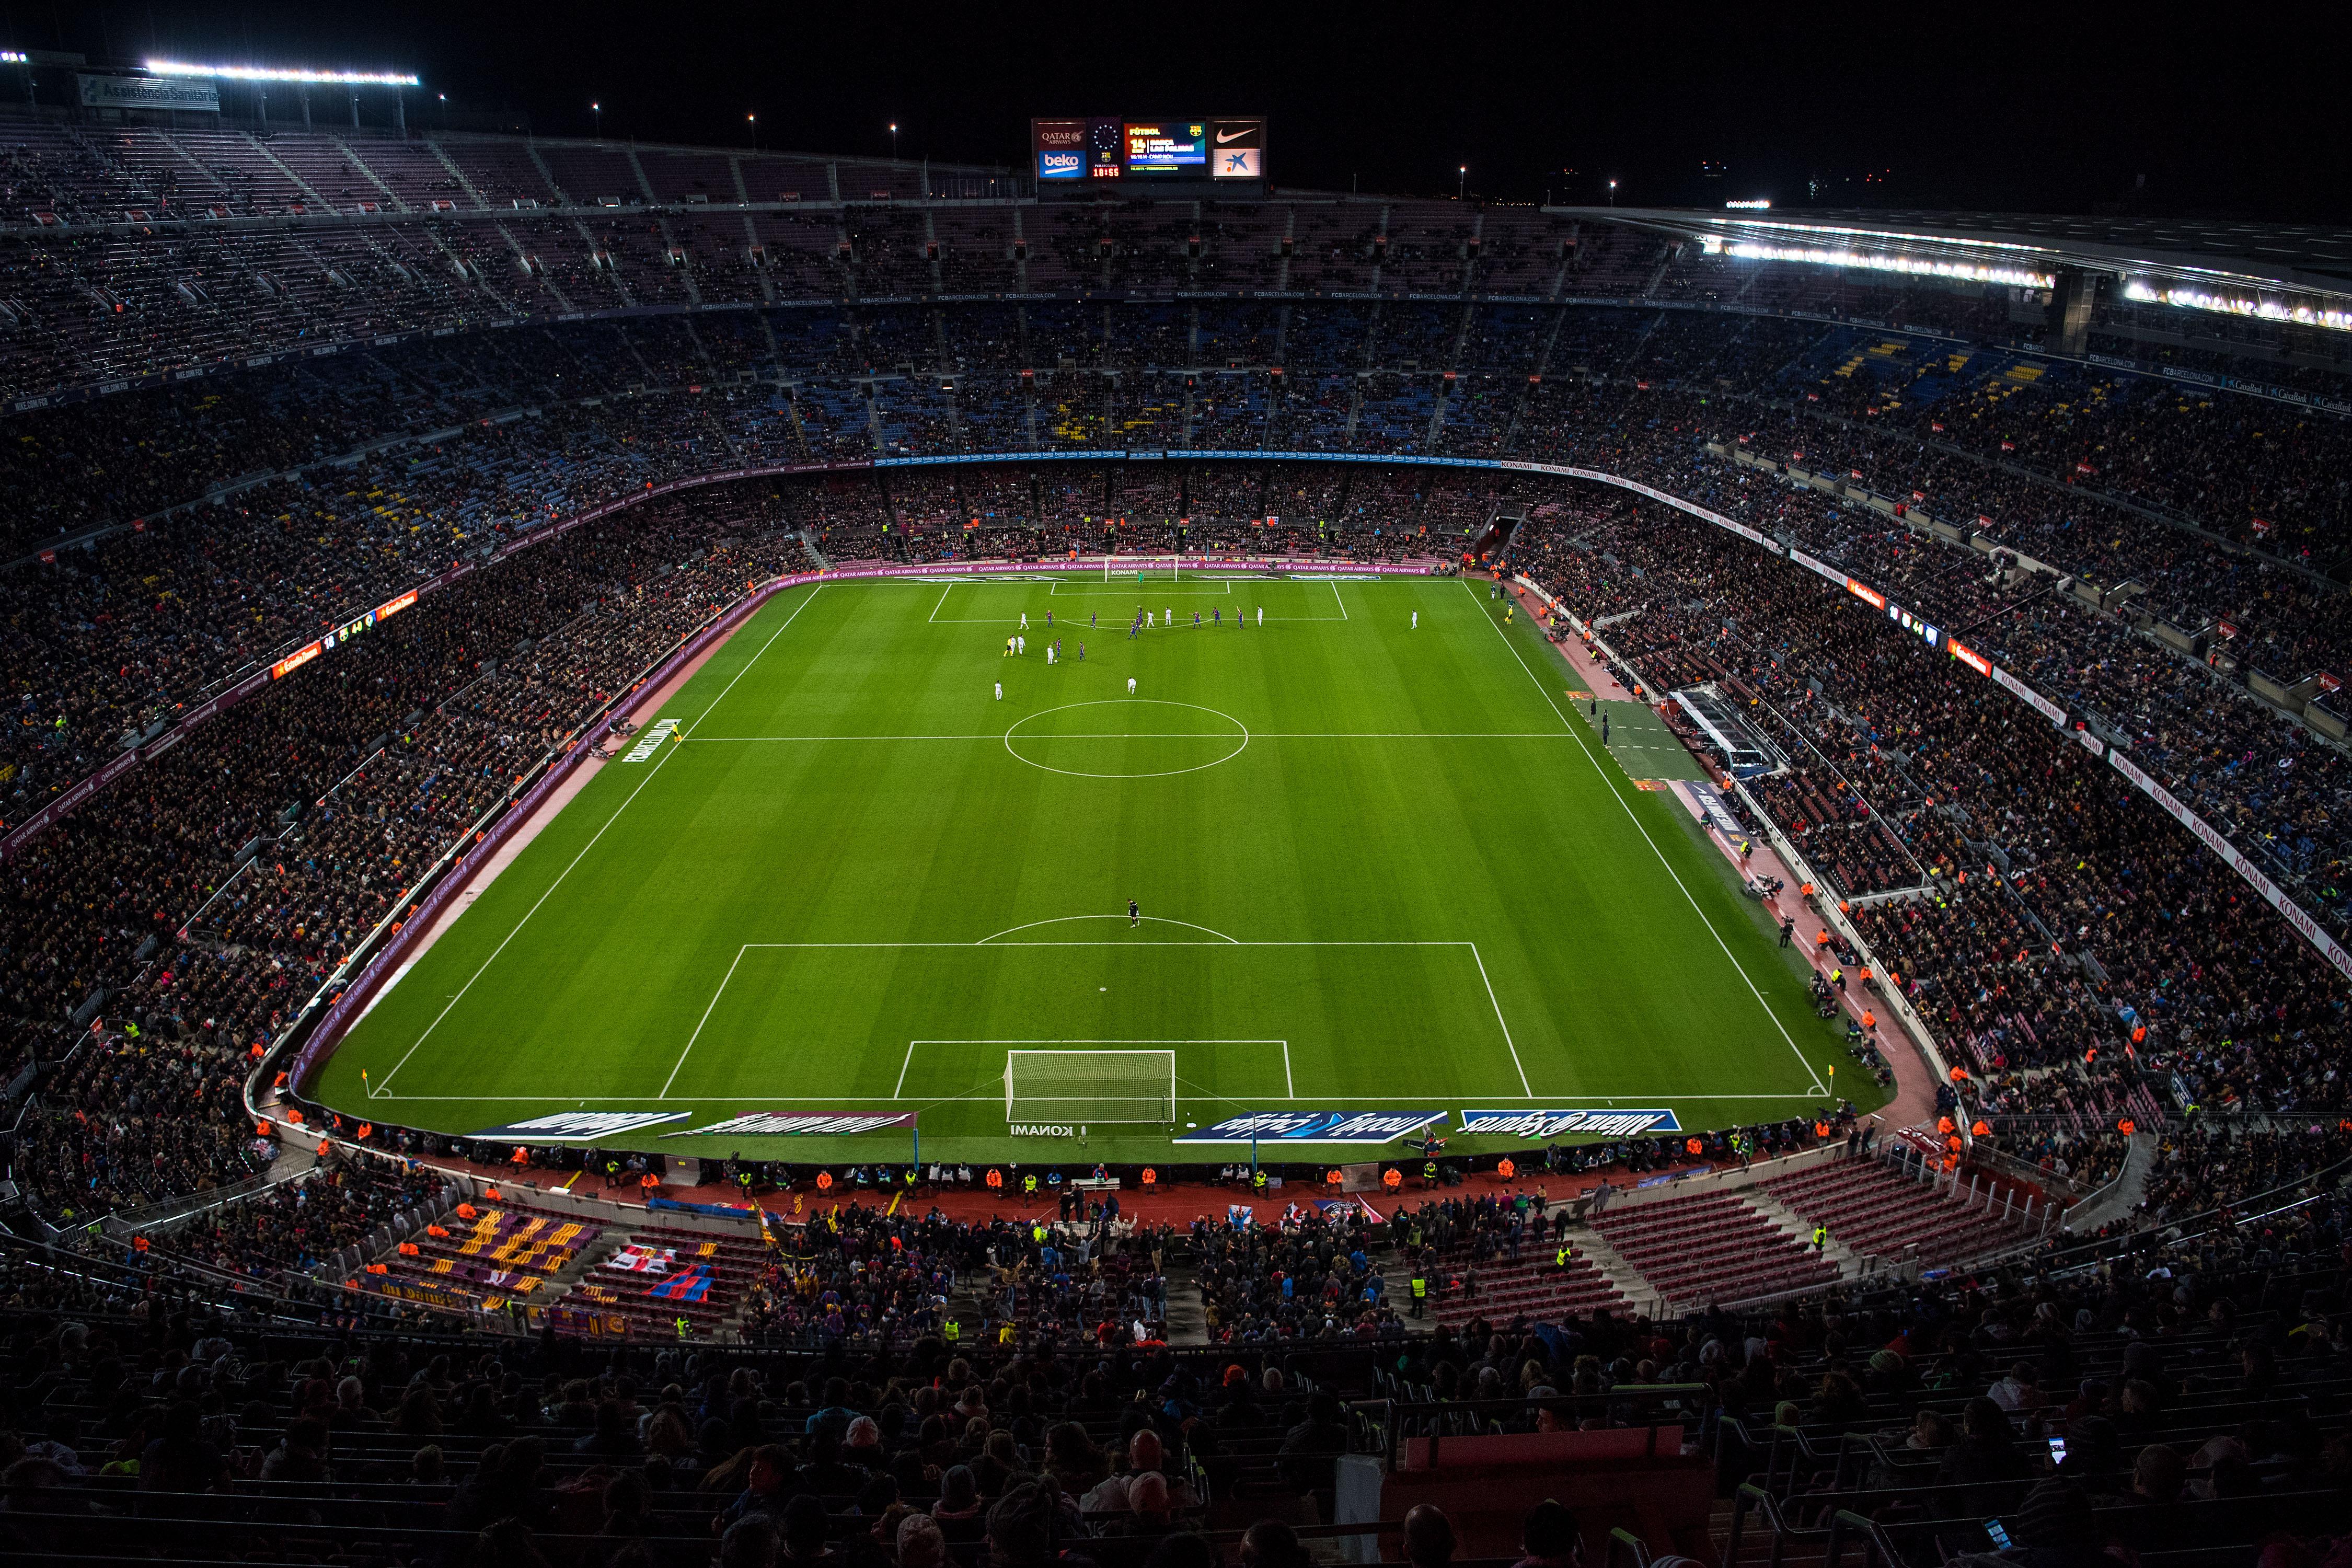 Barcelona Vs Man City Logo: Manchester City Vs Barcelona, 2016 Champions League: Final